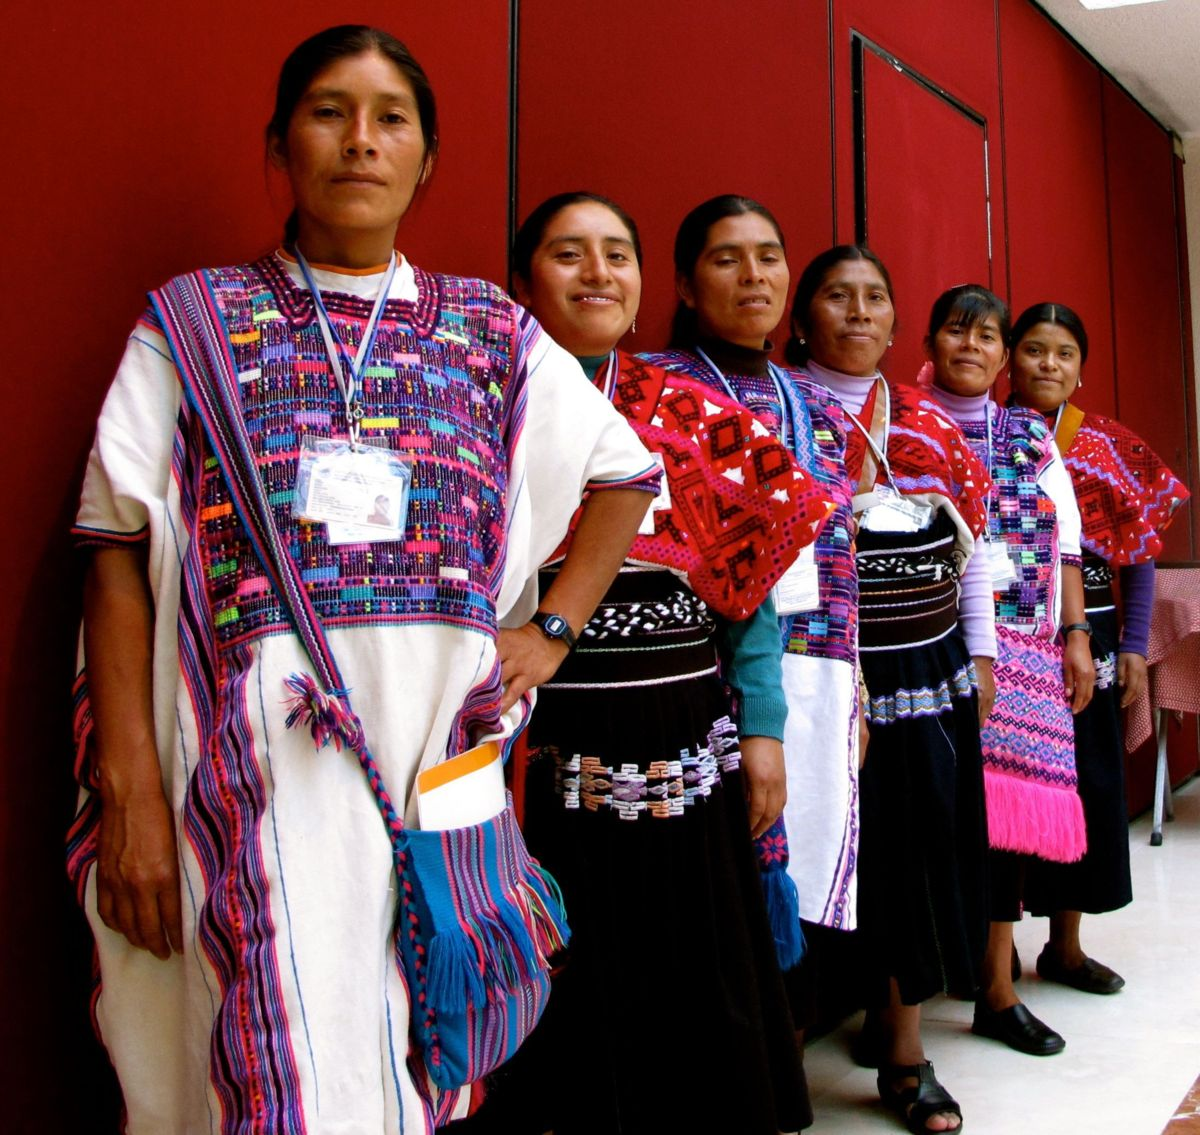 Resultado de imagen para mujeres mazahuas